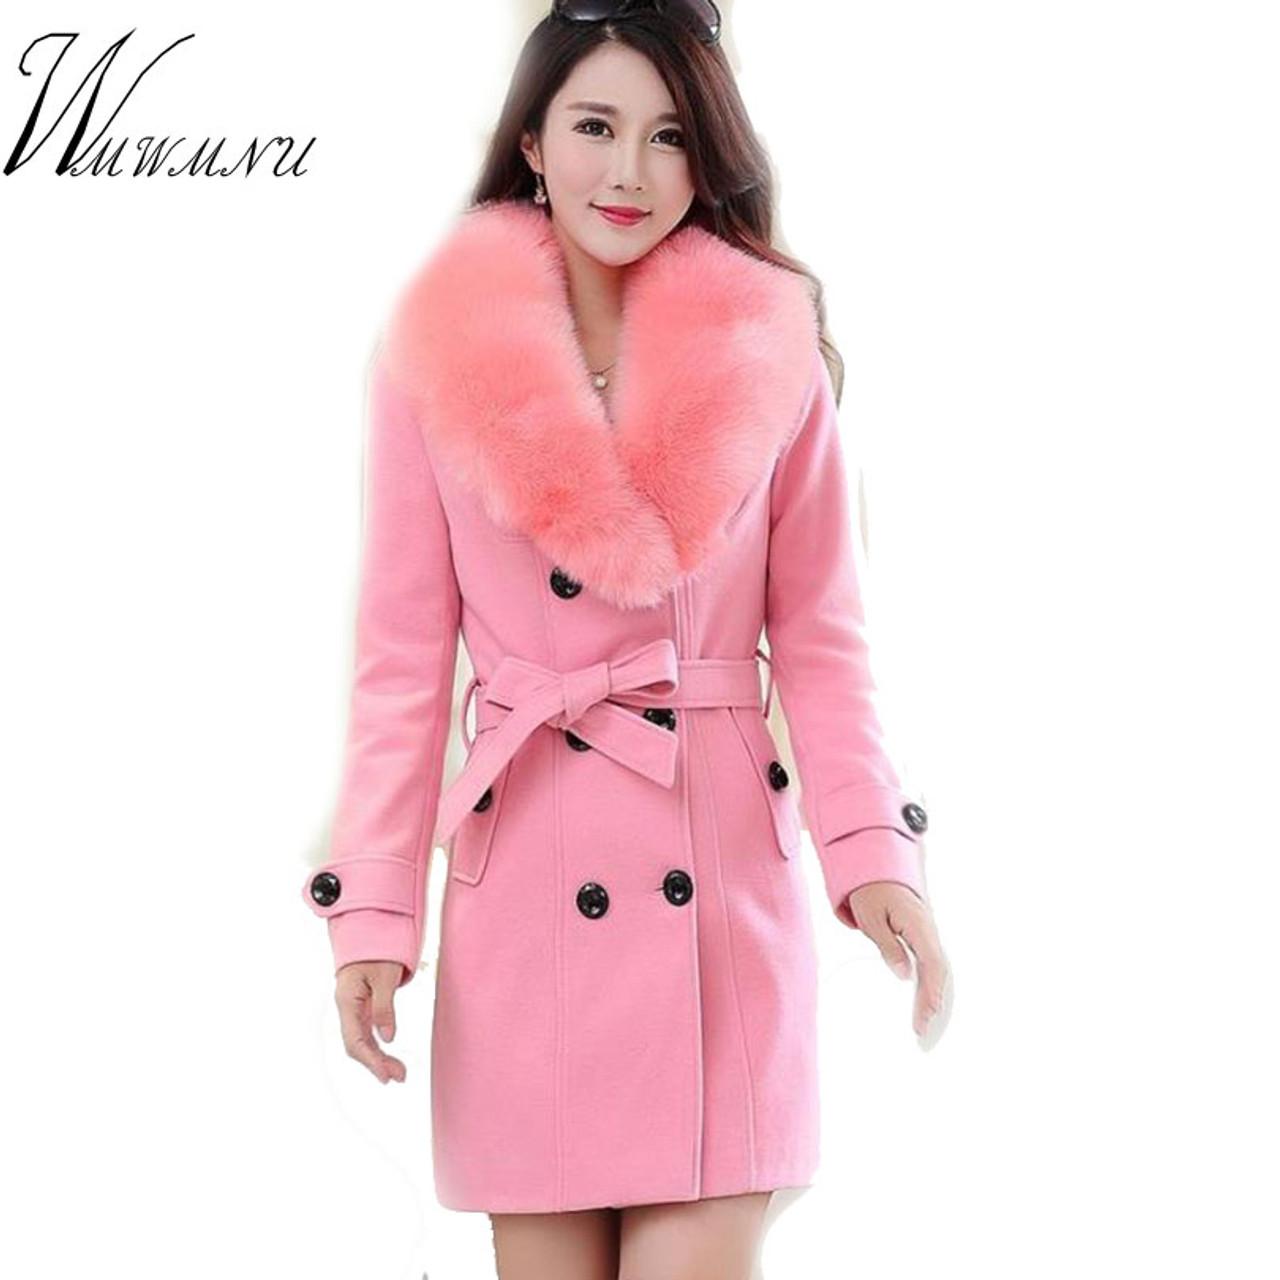 9597730dc3 ... WMWMNU 2018 winter fashion slim long wool coat women Big Fur Collar  Double Breasted warm wool ...